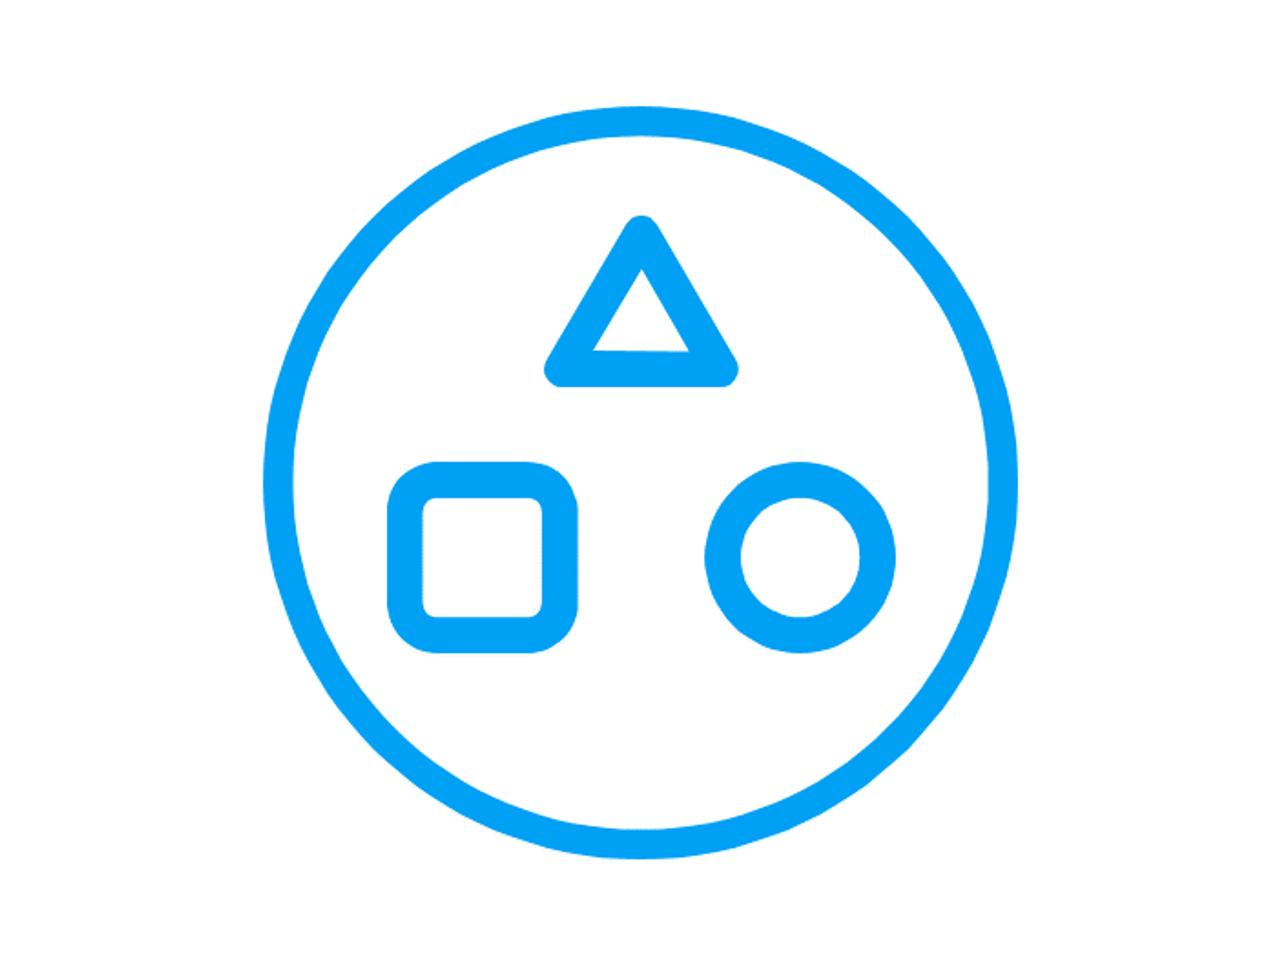 Maintenance Assistance System; Maintenance Assistance System, Digitalisation; Maintenance Management; IoT; Internet of Things; Digital Services; Machine Availability; Maintenance Performance; Documentation; Maintenance; Mining technologies, Materials Handling; Mineral Processing